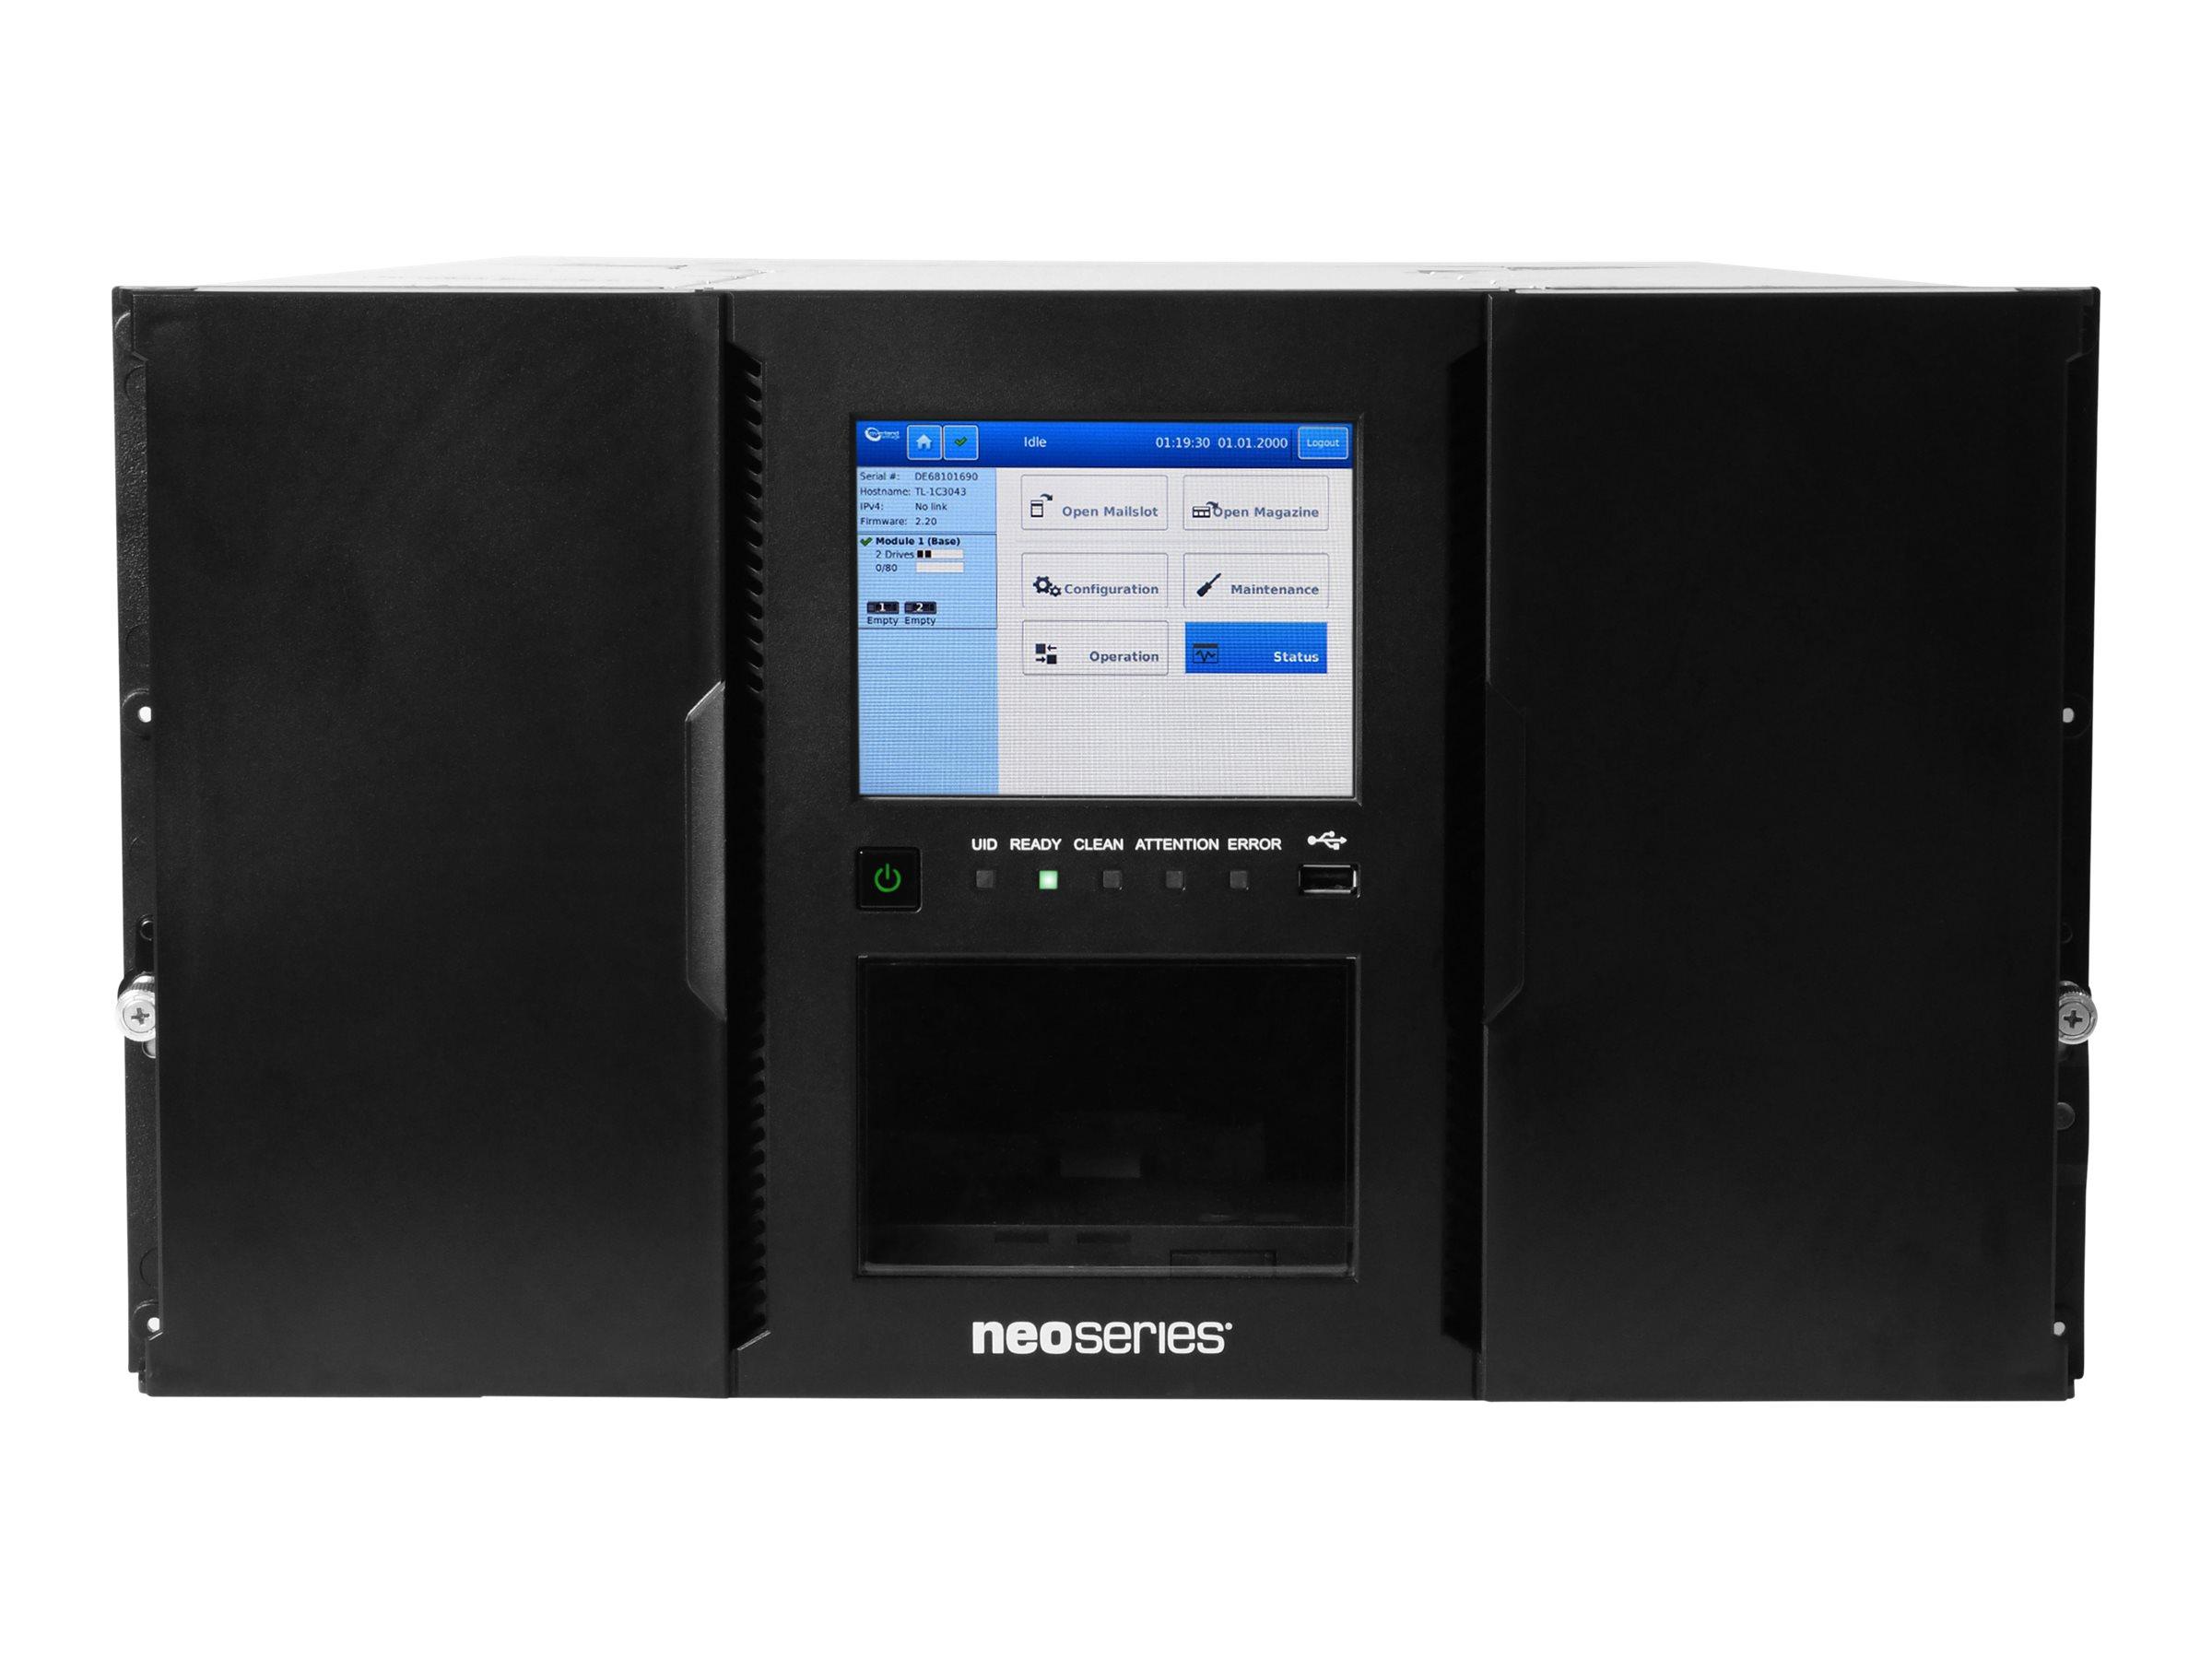 Overland Tandberg NEOxl 80 - Bandbibliothek - 200 TB / 500 TB - Steckplätze: 80 - LTO Ultrium (2 TB / 5 TB)